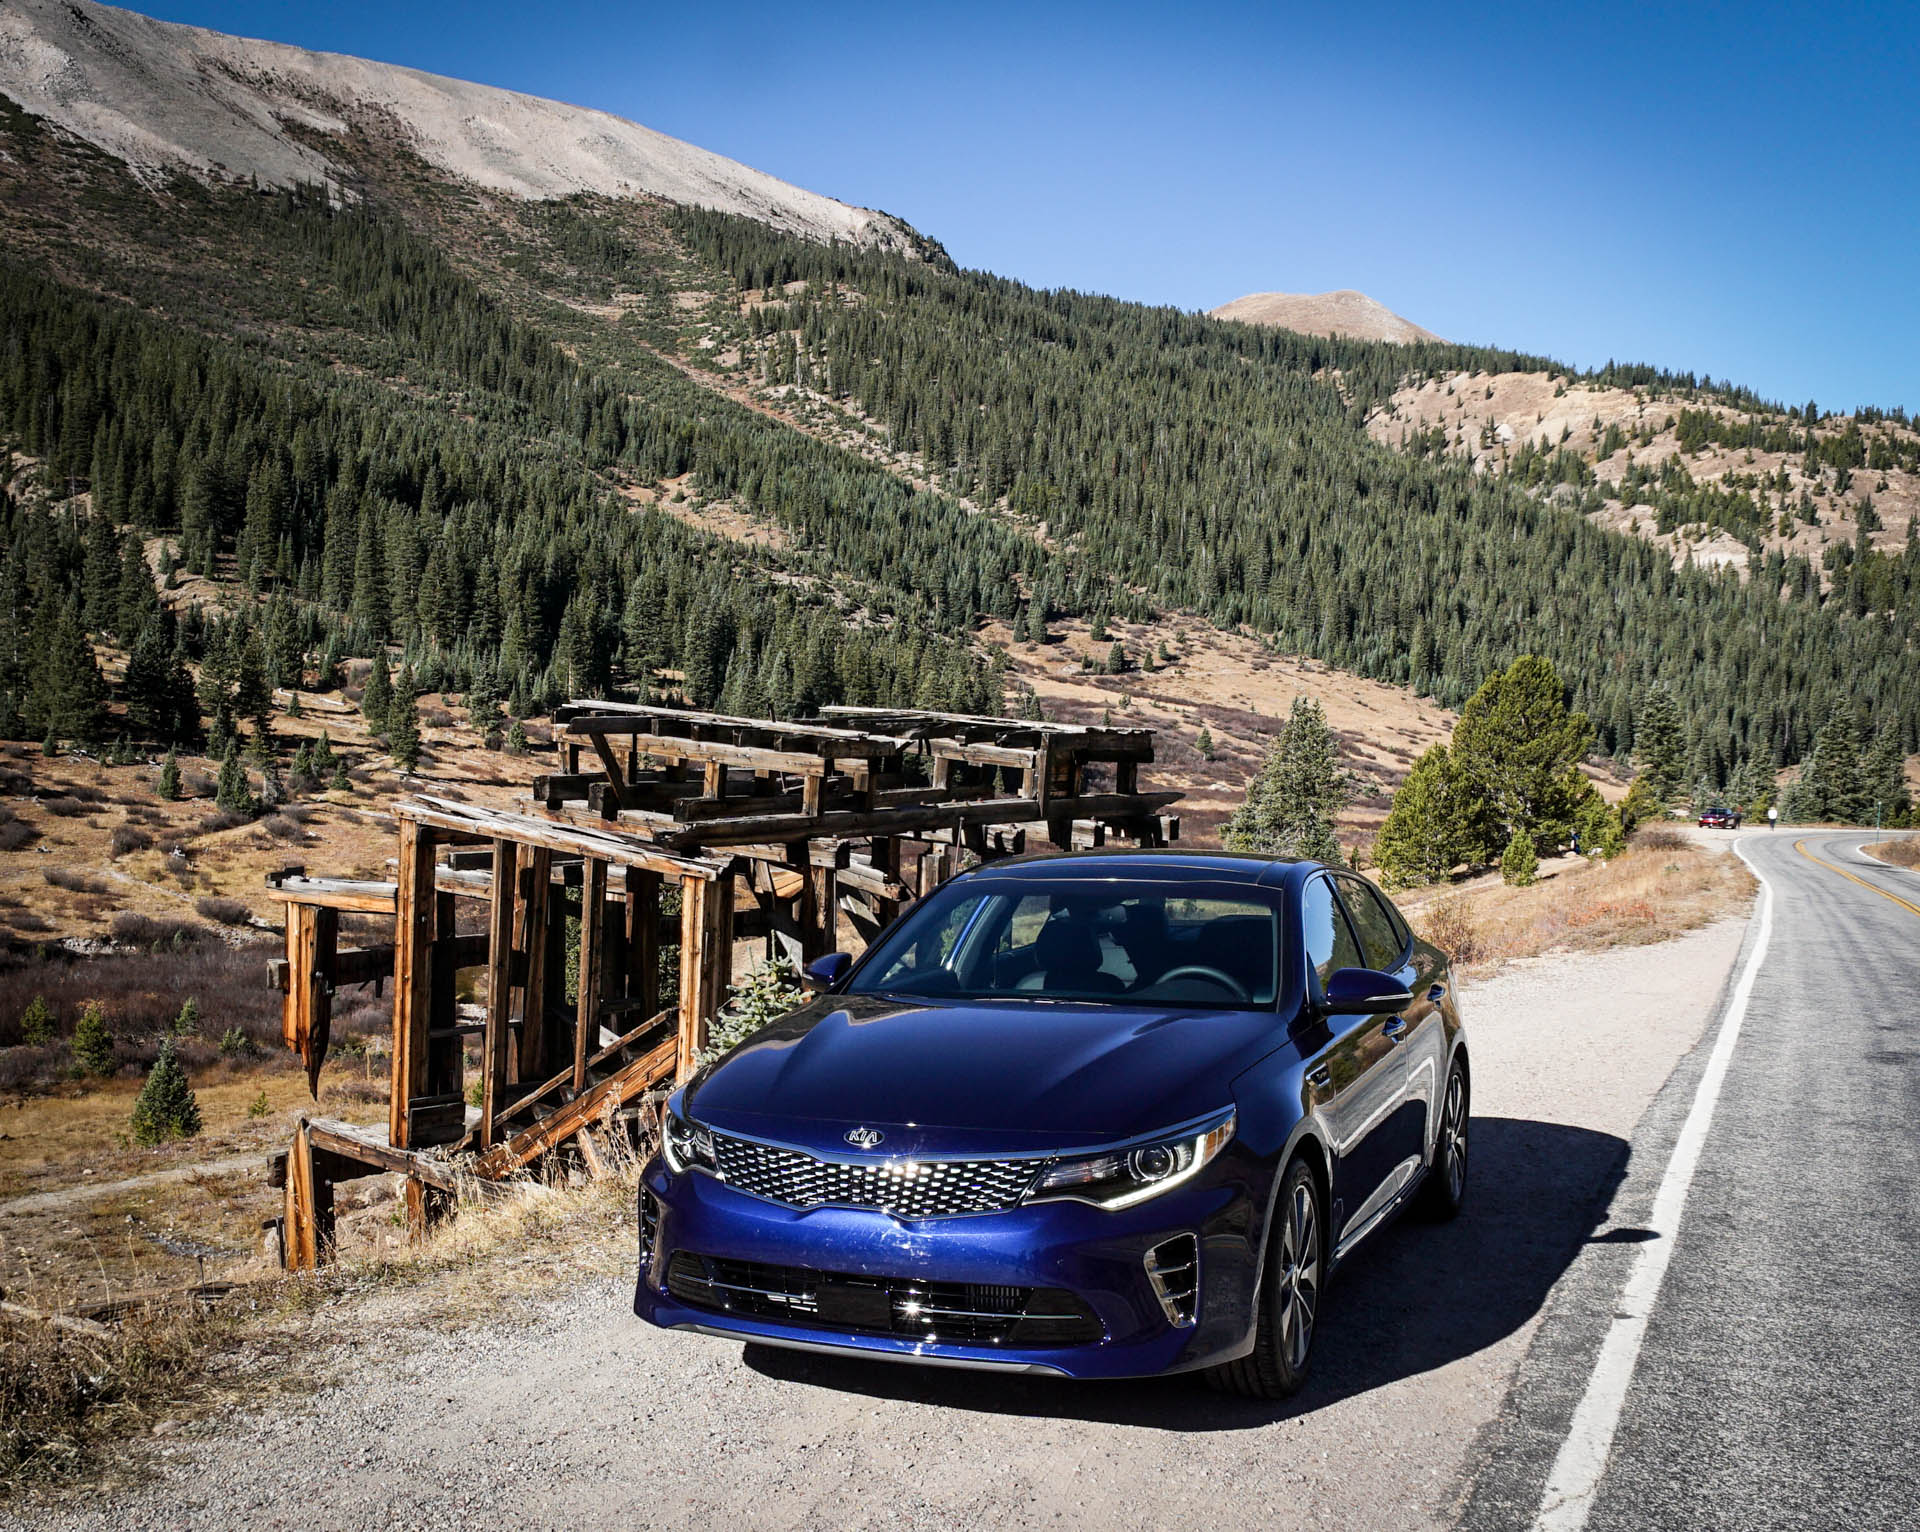 First Drive Review: 2016 Kia Optima SXL 2.0T